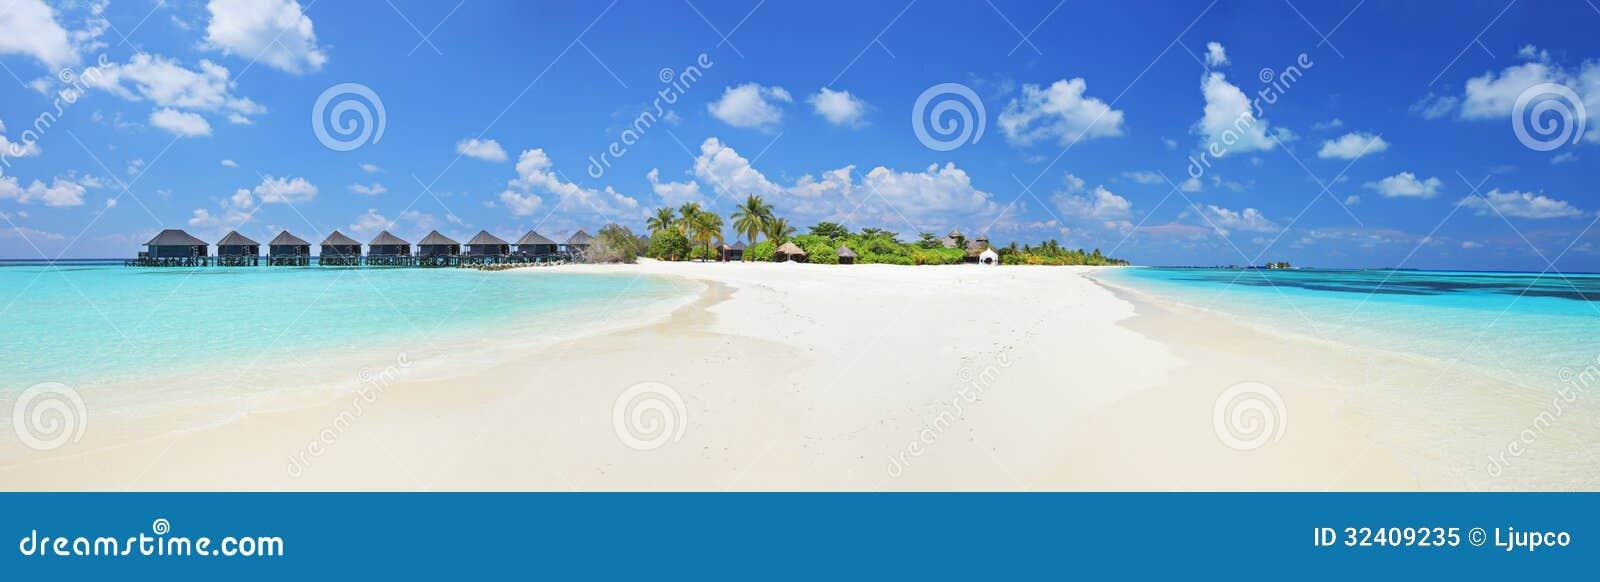 Panorama shot of a tropical islandl, Maldives on a sunny day